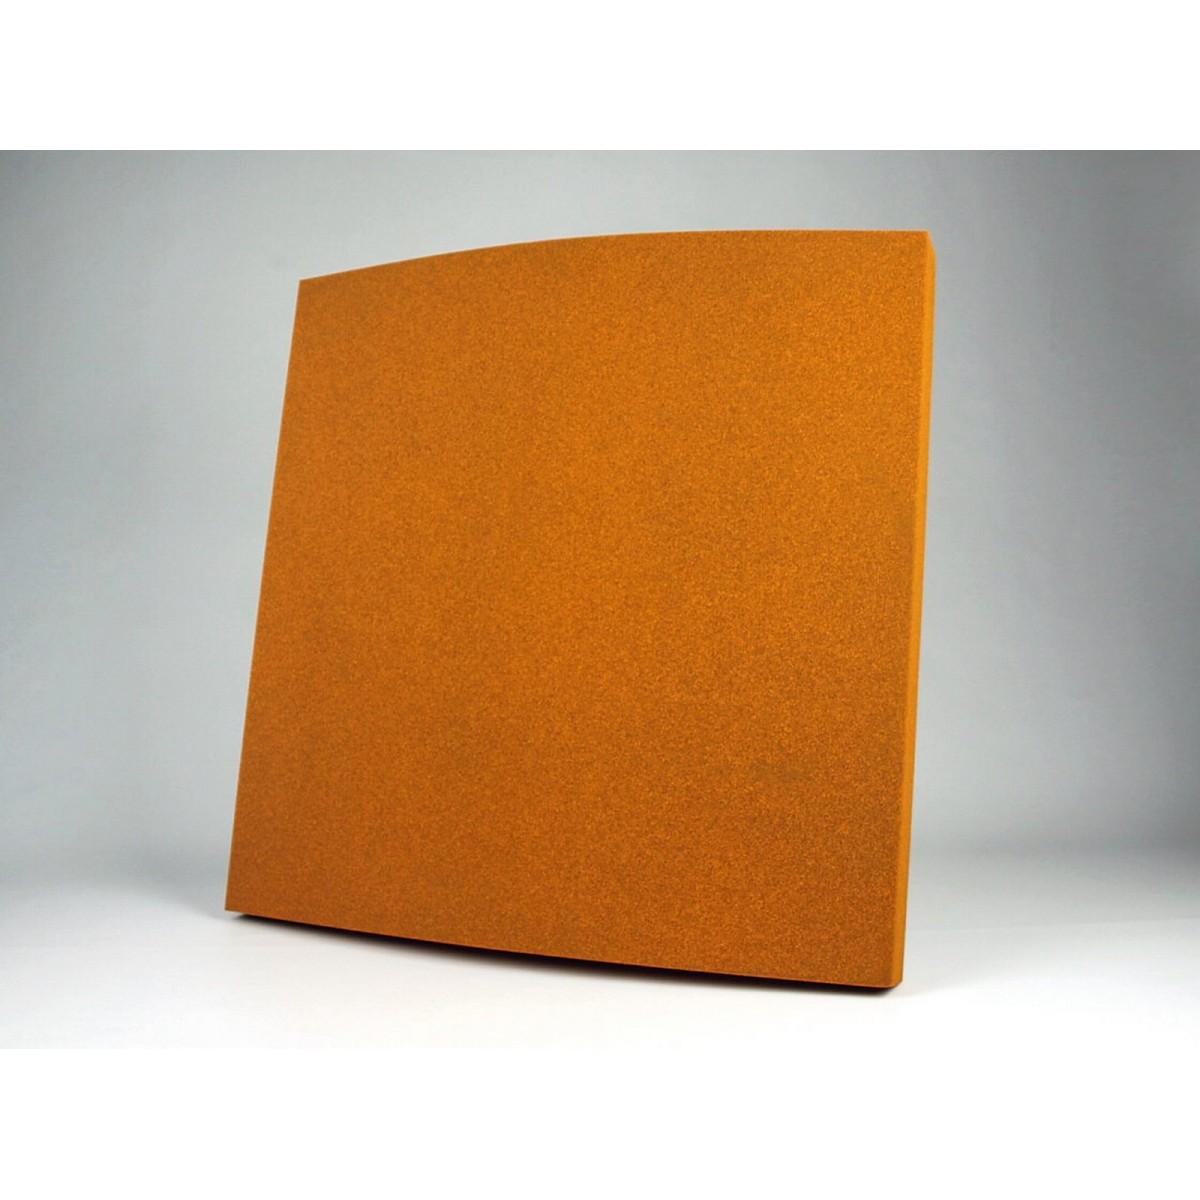 eliacoustic pure orange